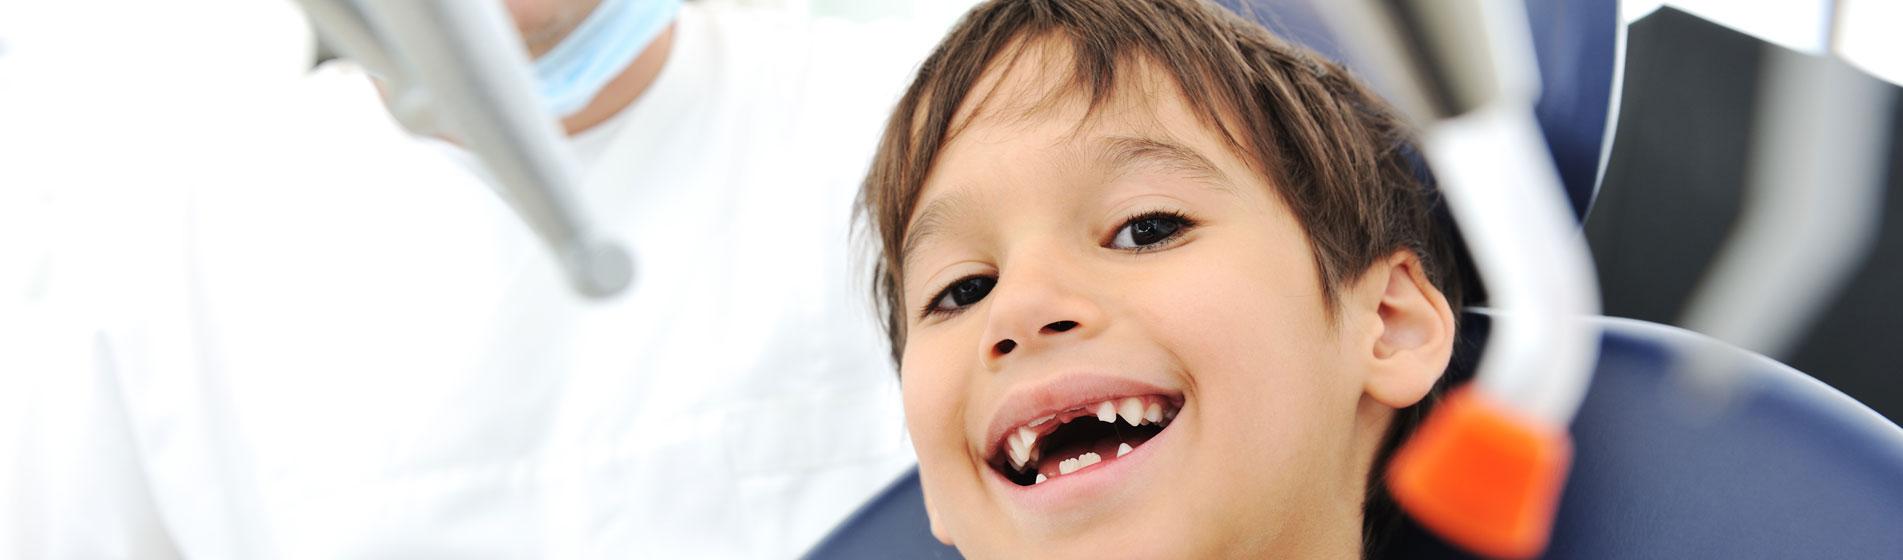 dental-checkup-3